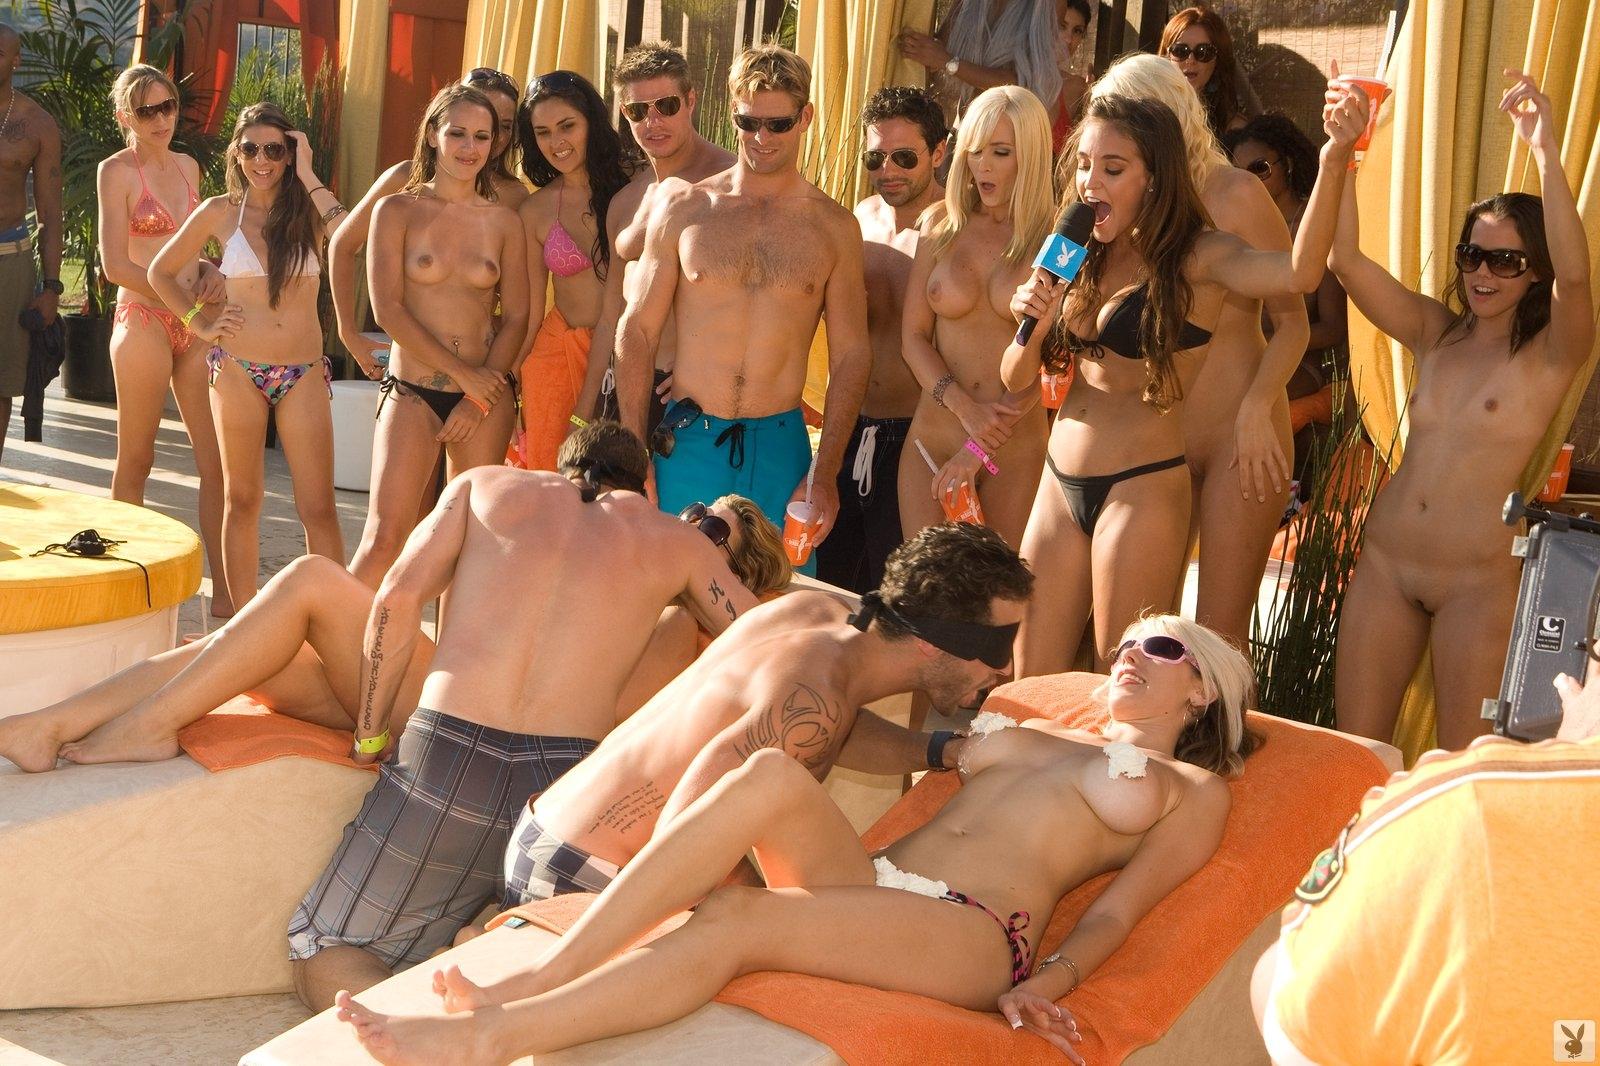 Playboy's Beach House Episode 02 Playboy Plus (8)